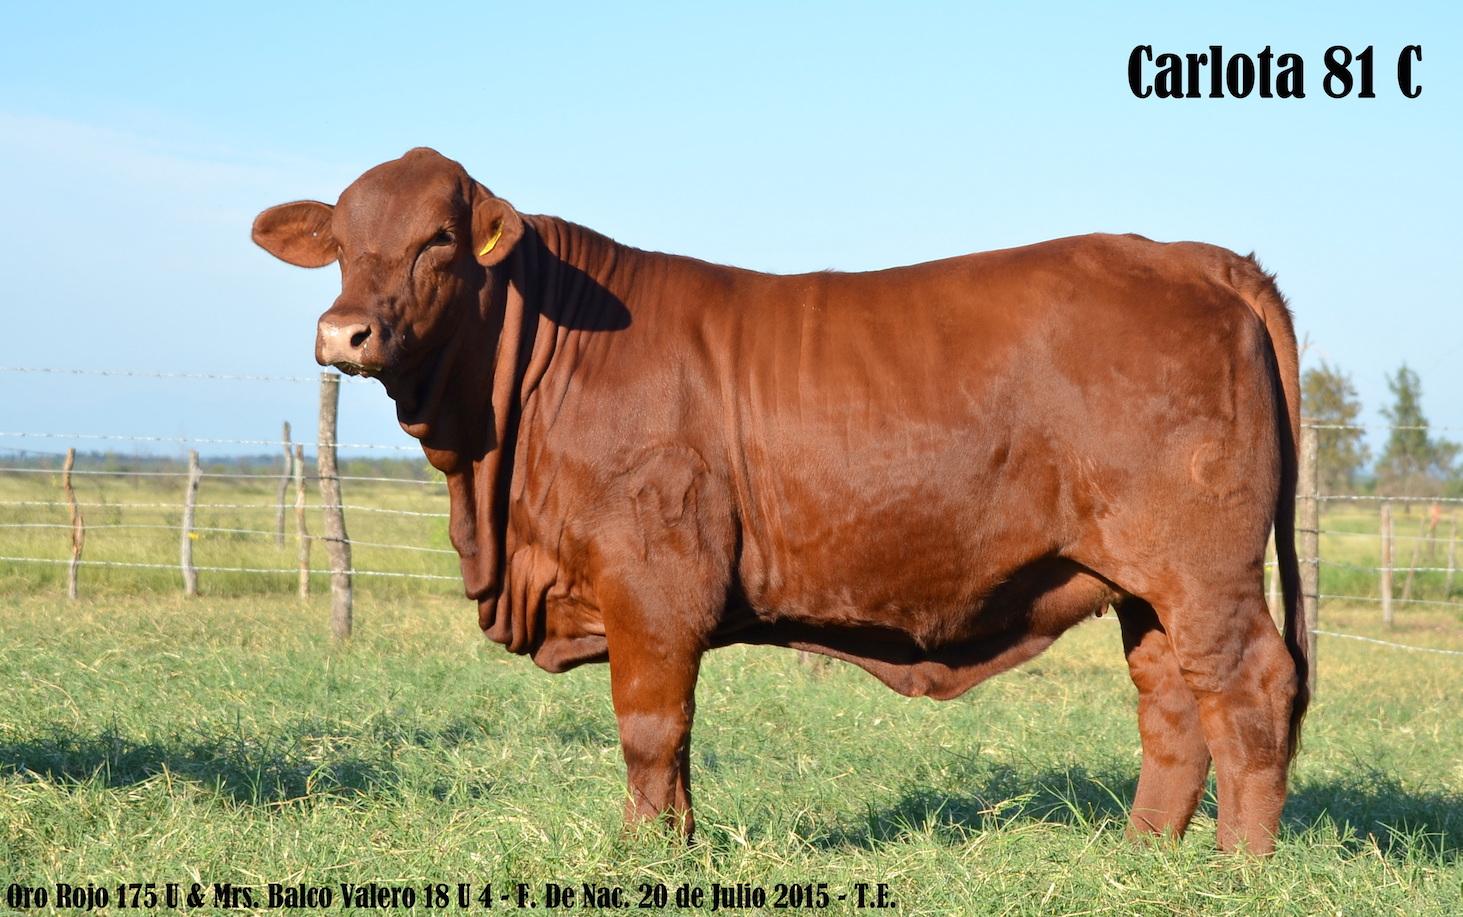 Vaca Brangus Rojo Carlota 81 C